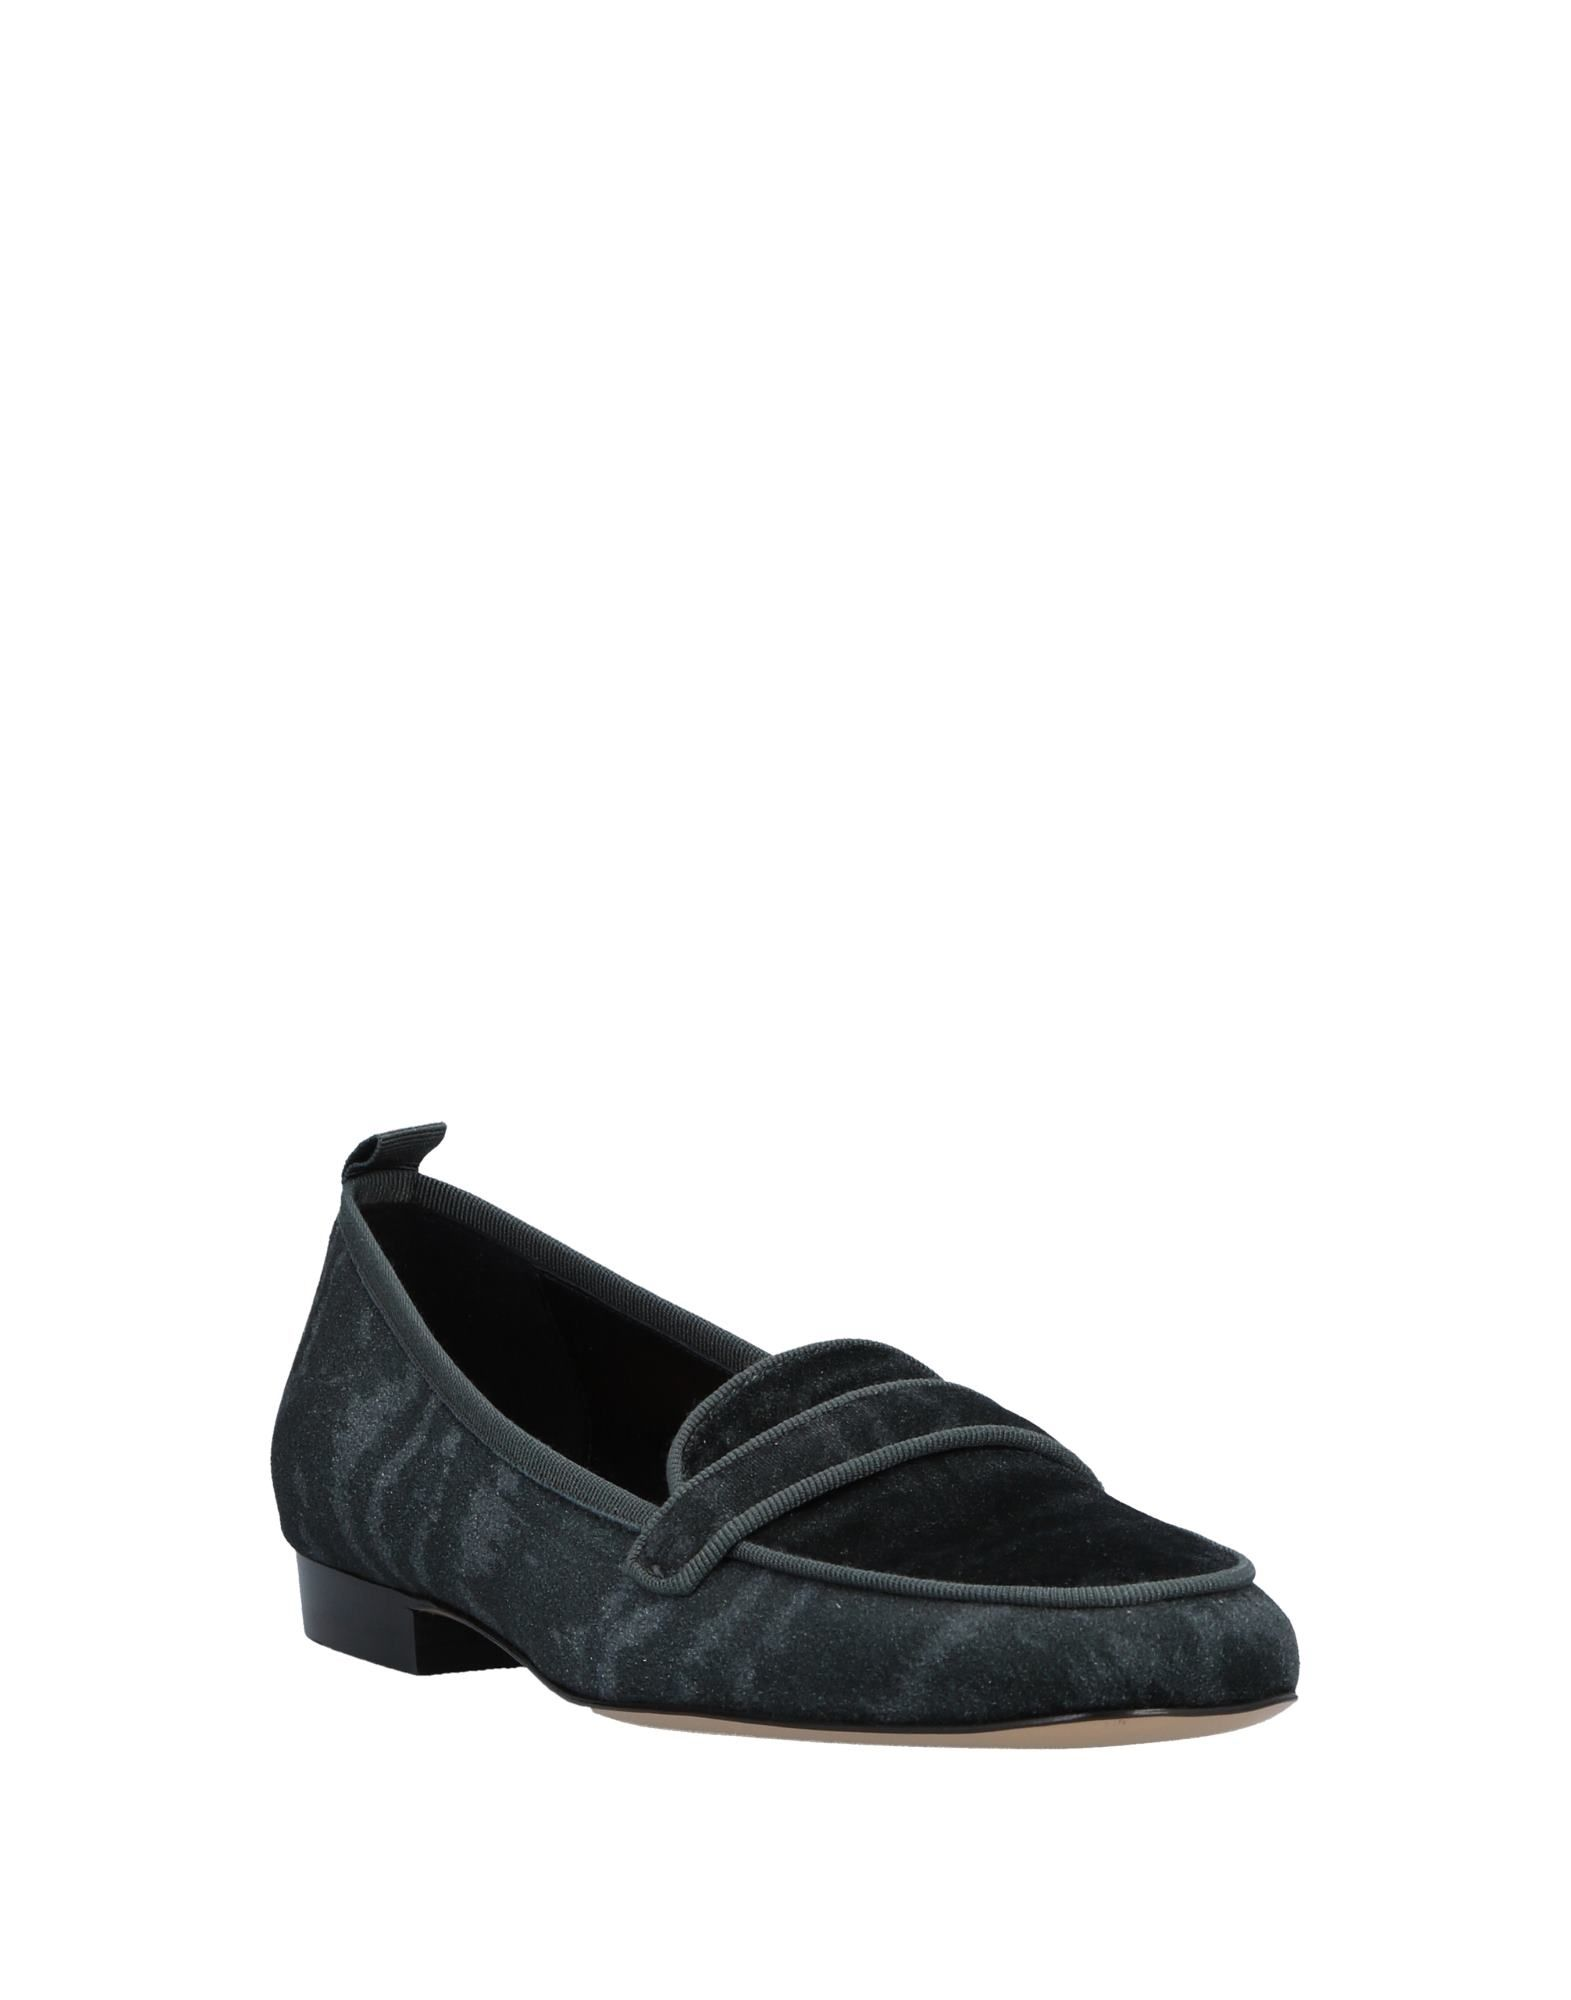 Stilvolle Mokassins billige Schuhe Gianna Meliani Mokassins Stilvolle Damen  11507108CN 3ab85c